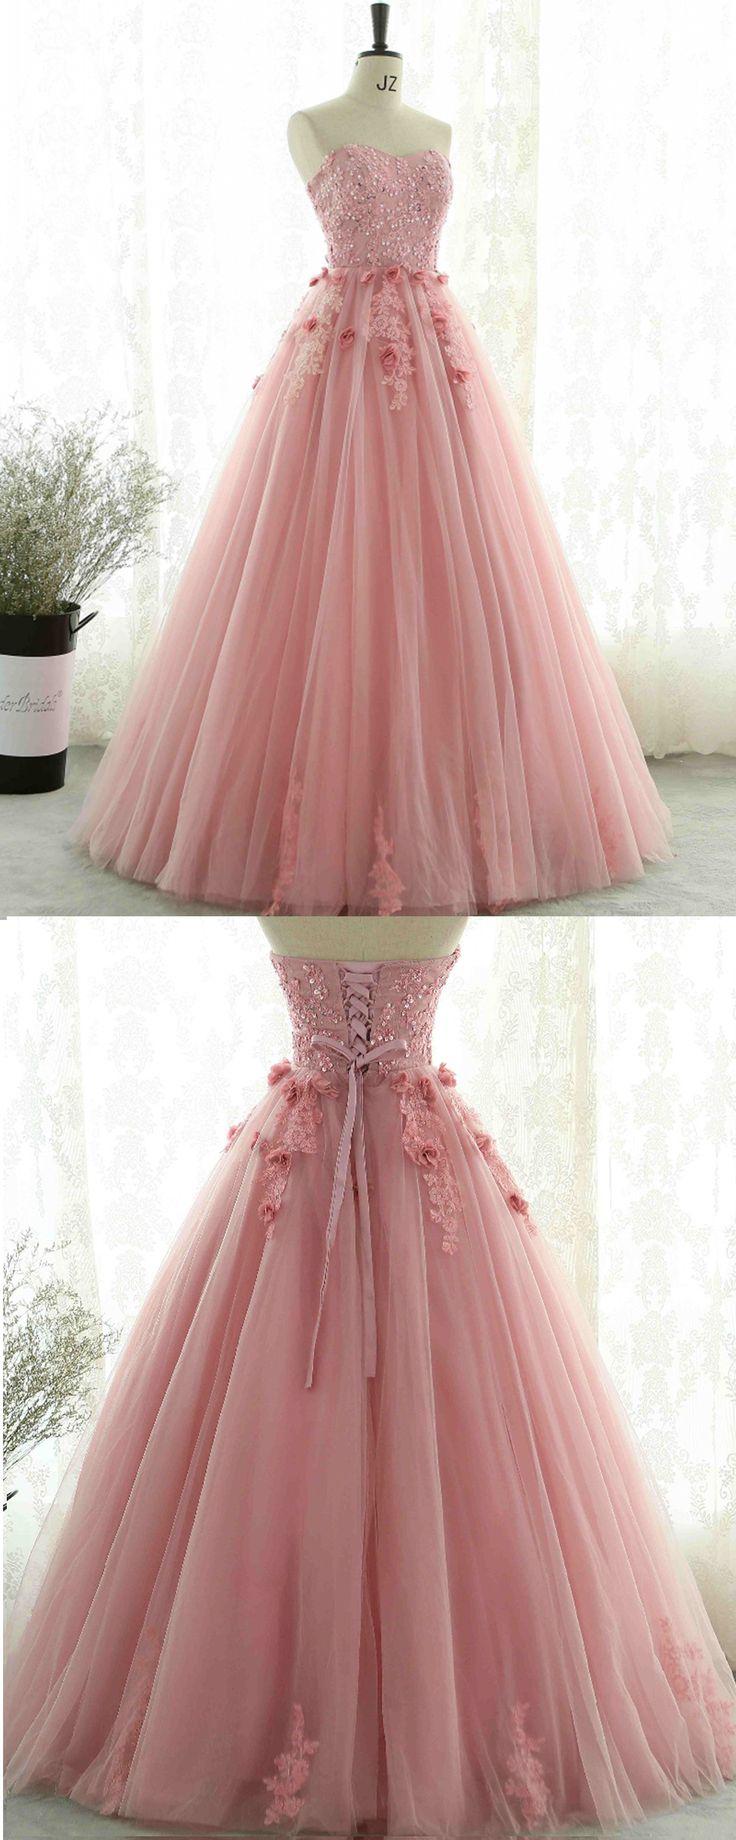 30 best vestidos images on Pinterest | Wedding ideas, 15 dresses and ...